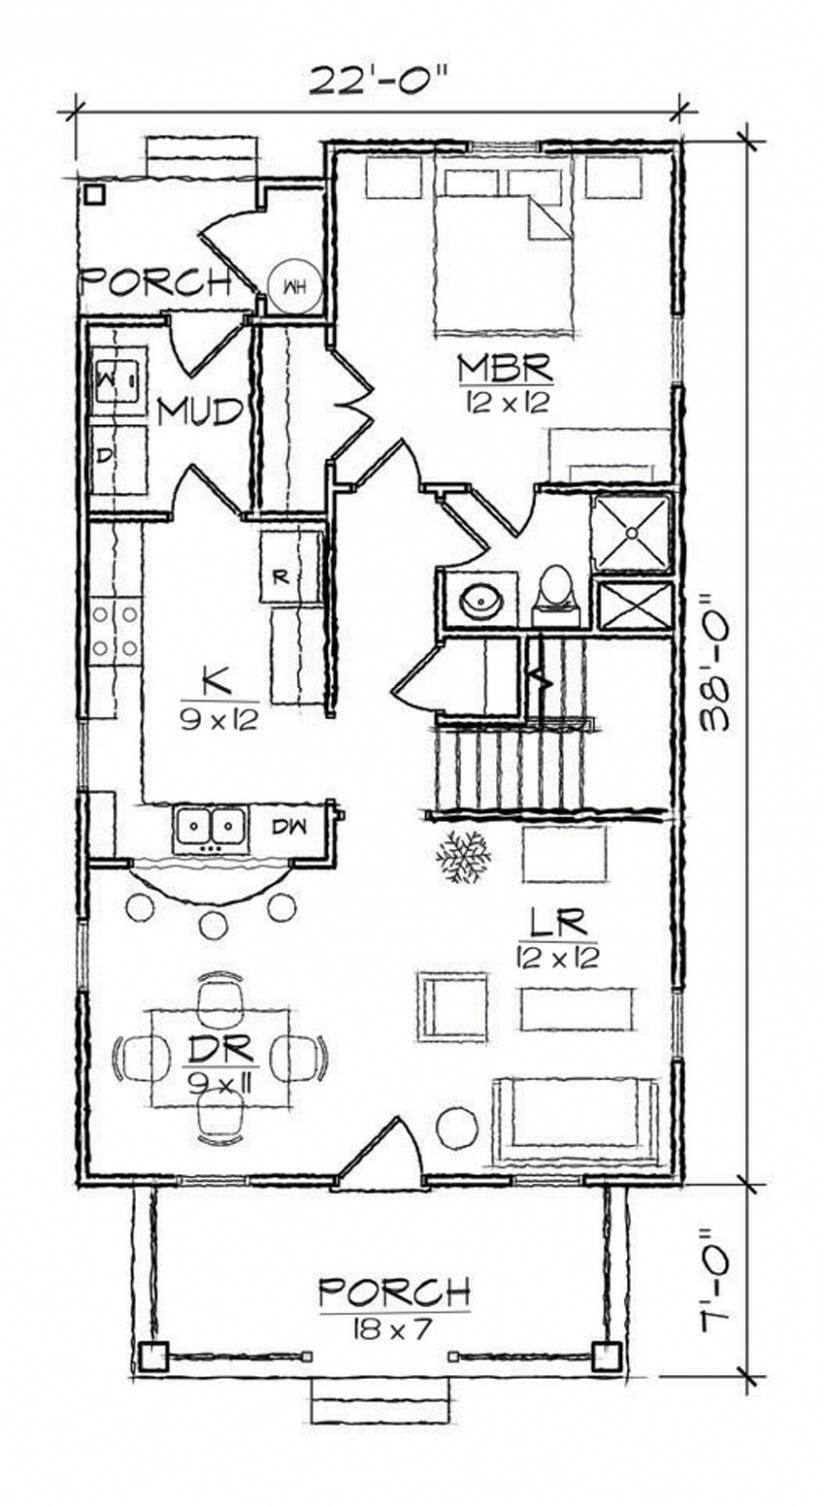 653973 3 Bedroom 2 Bath Bungalow open house plan